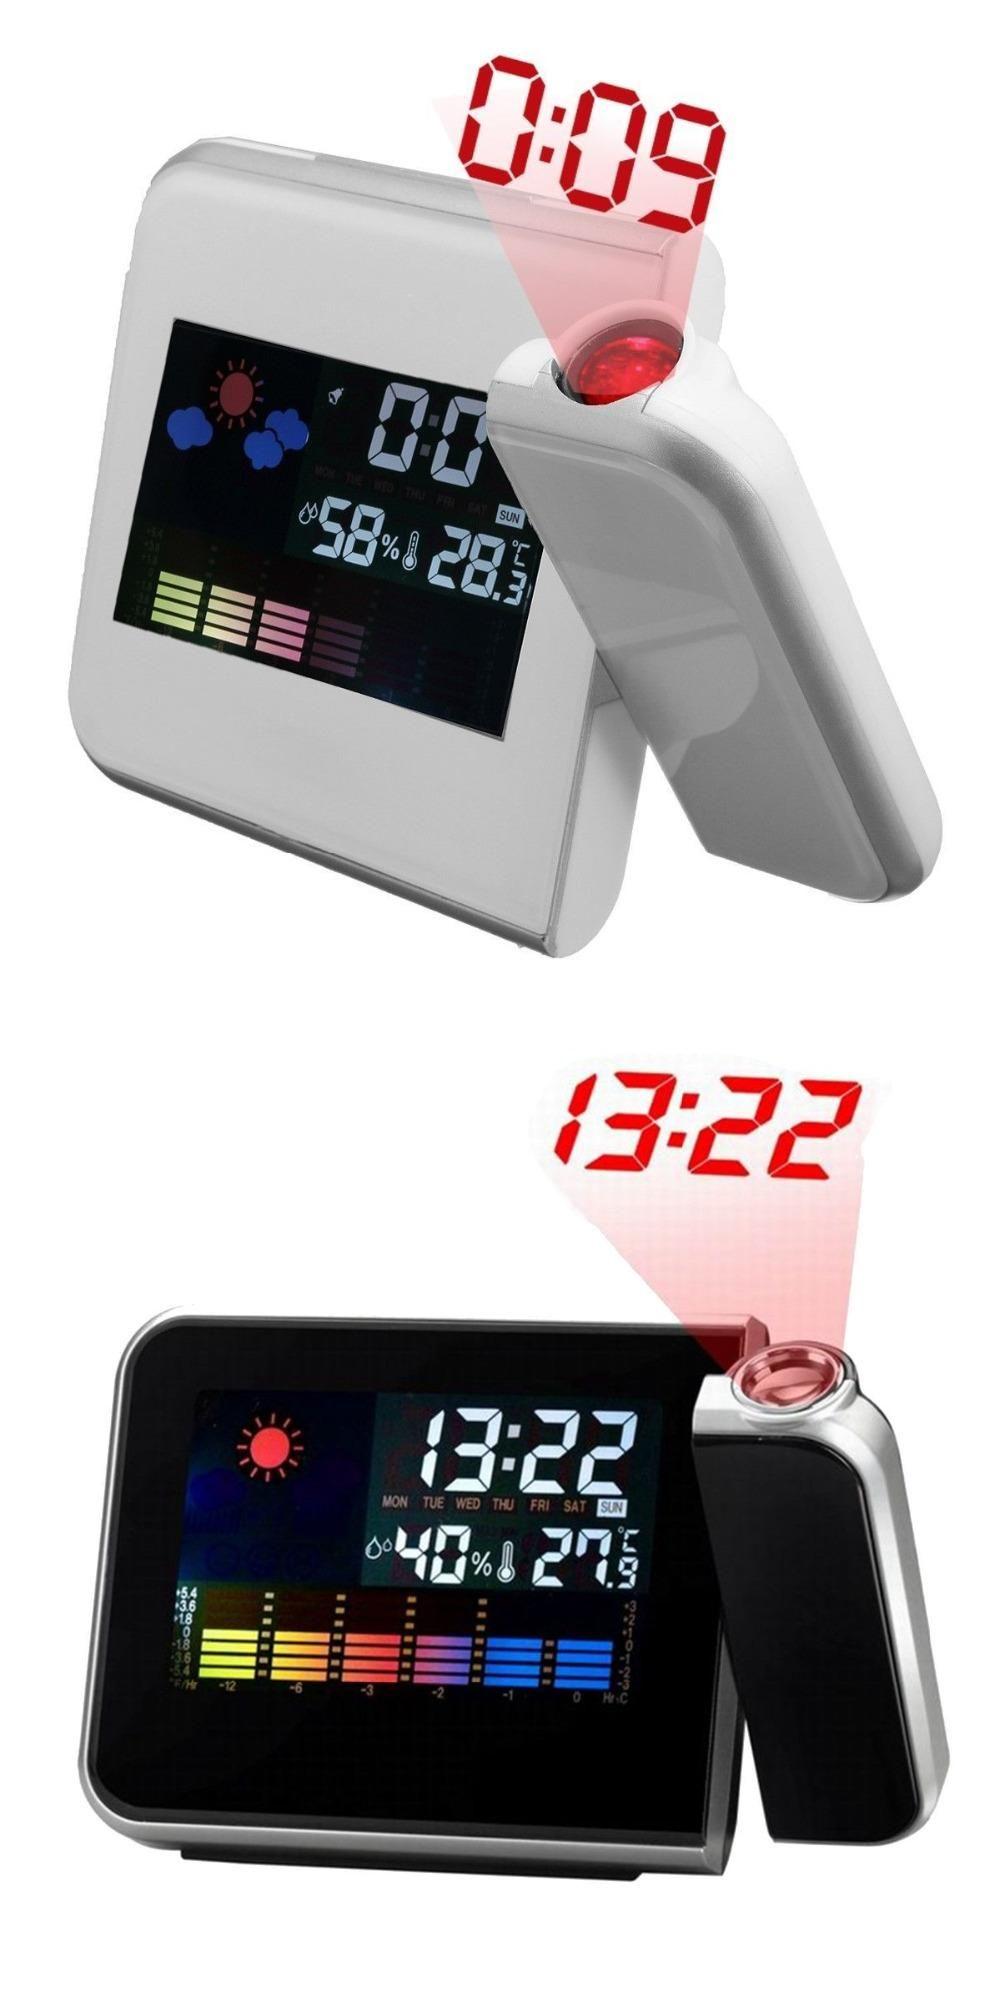 2017 Promotion Digital Projection Alarm Clock Weather